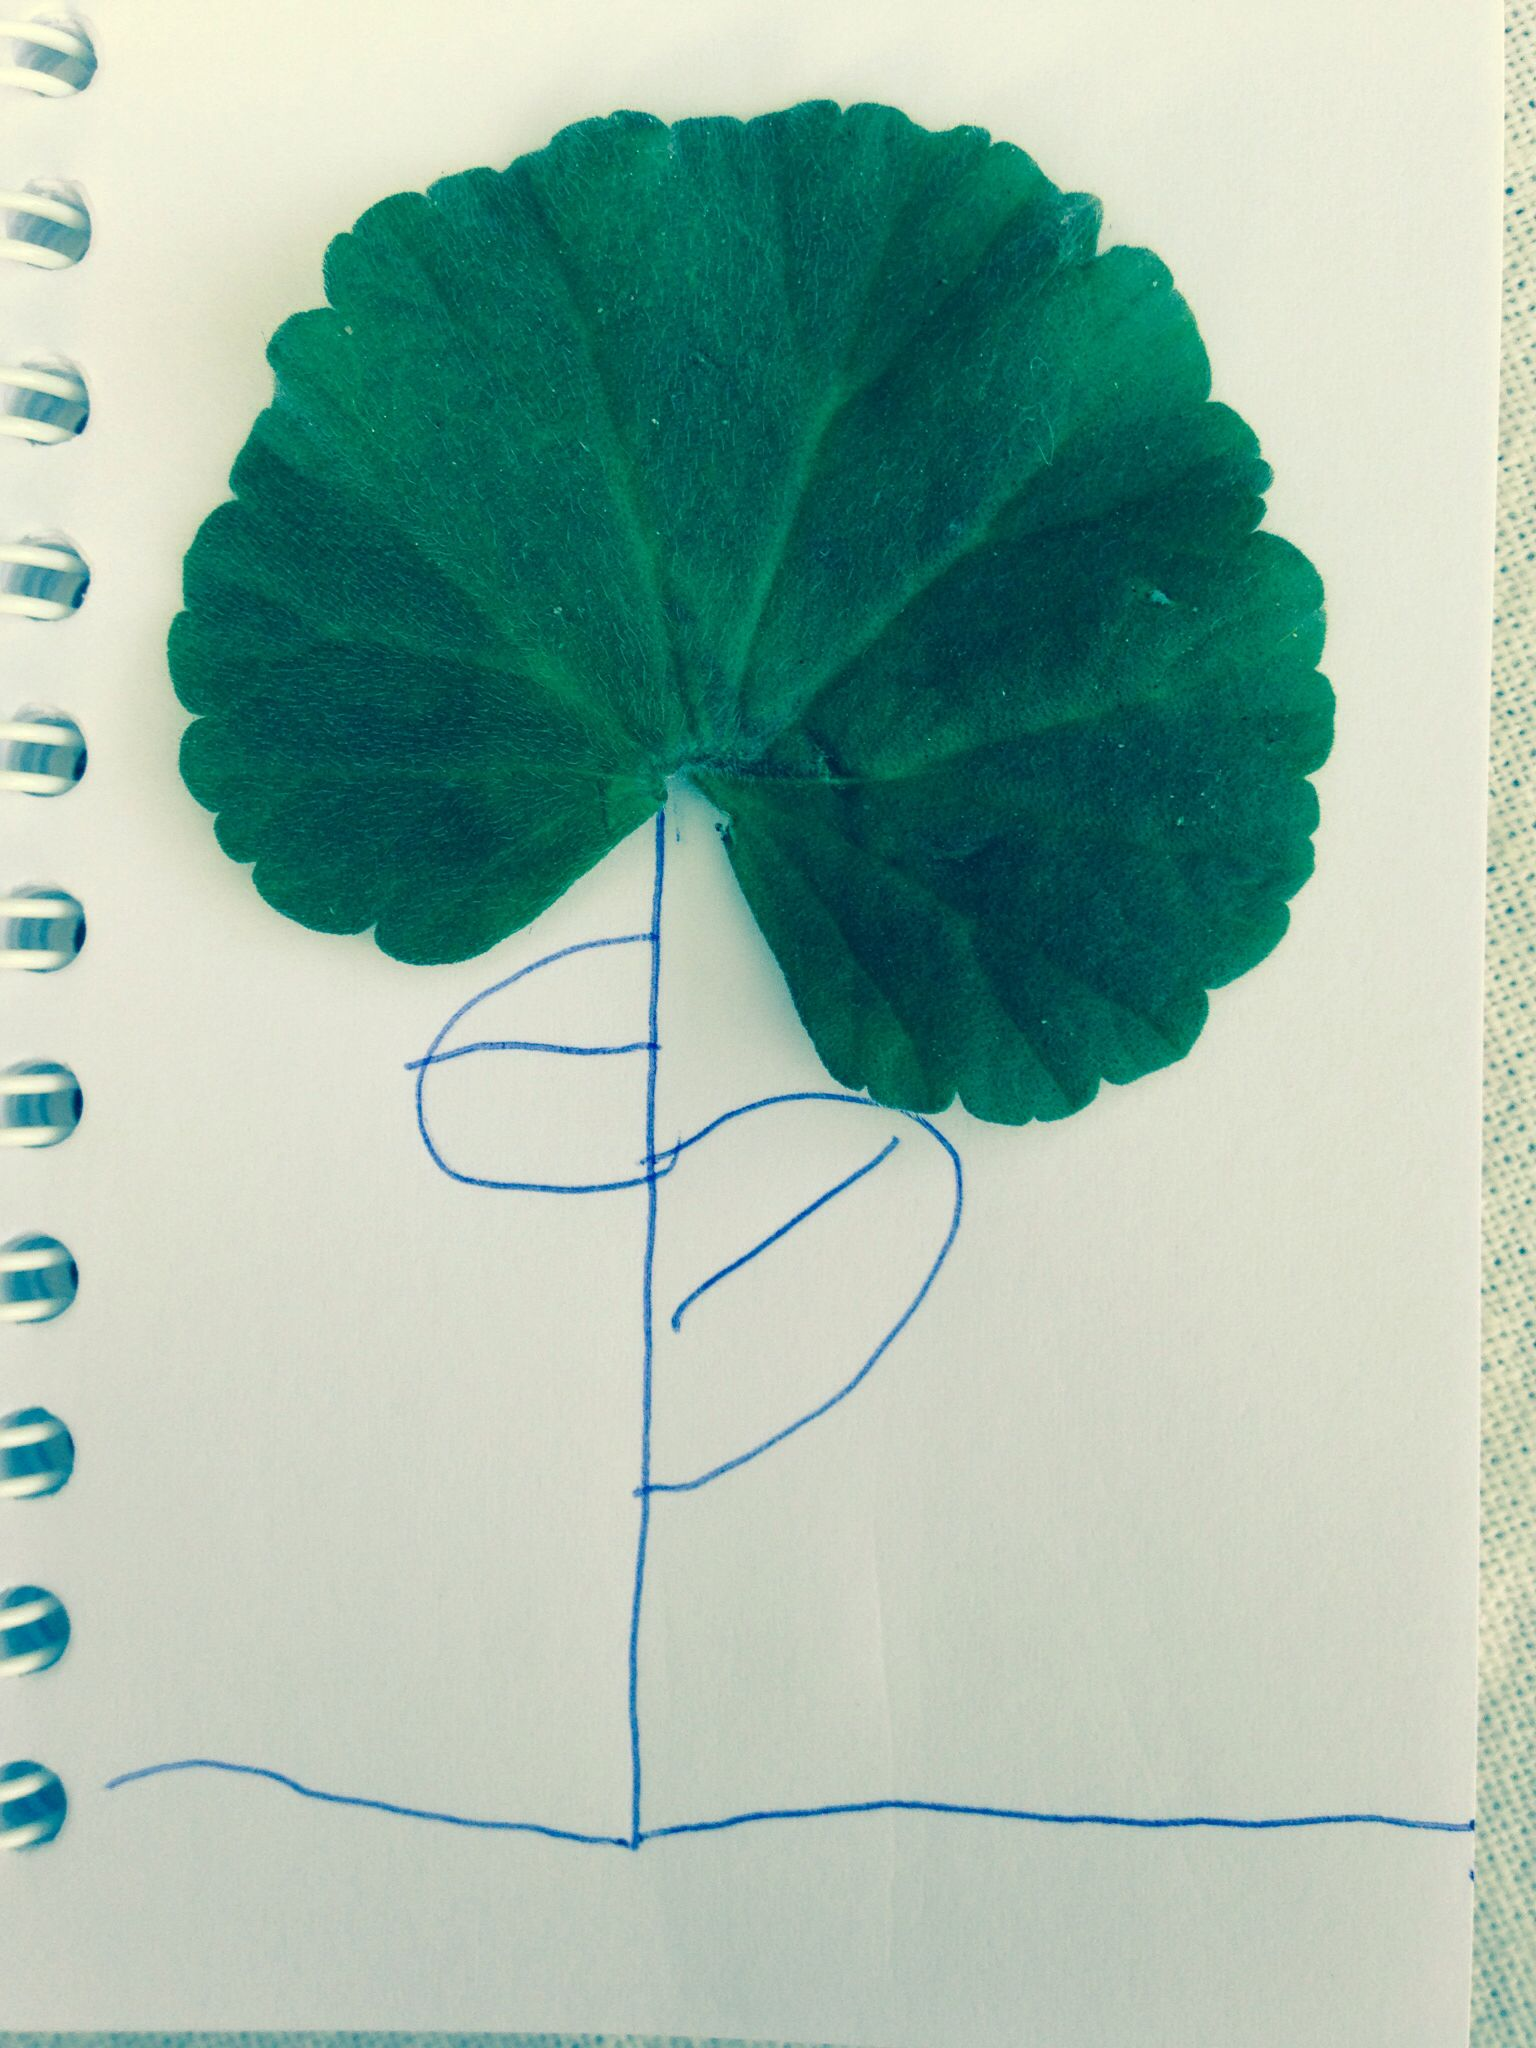 Leaf art geranium flower by Grace x